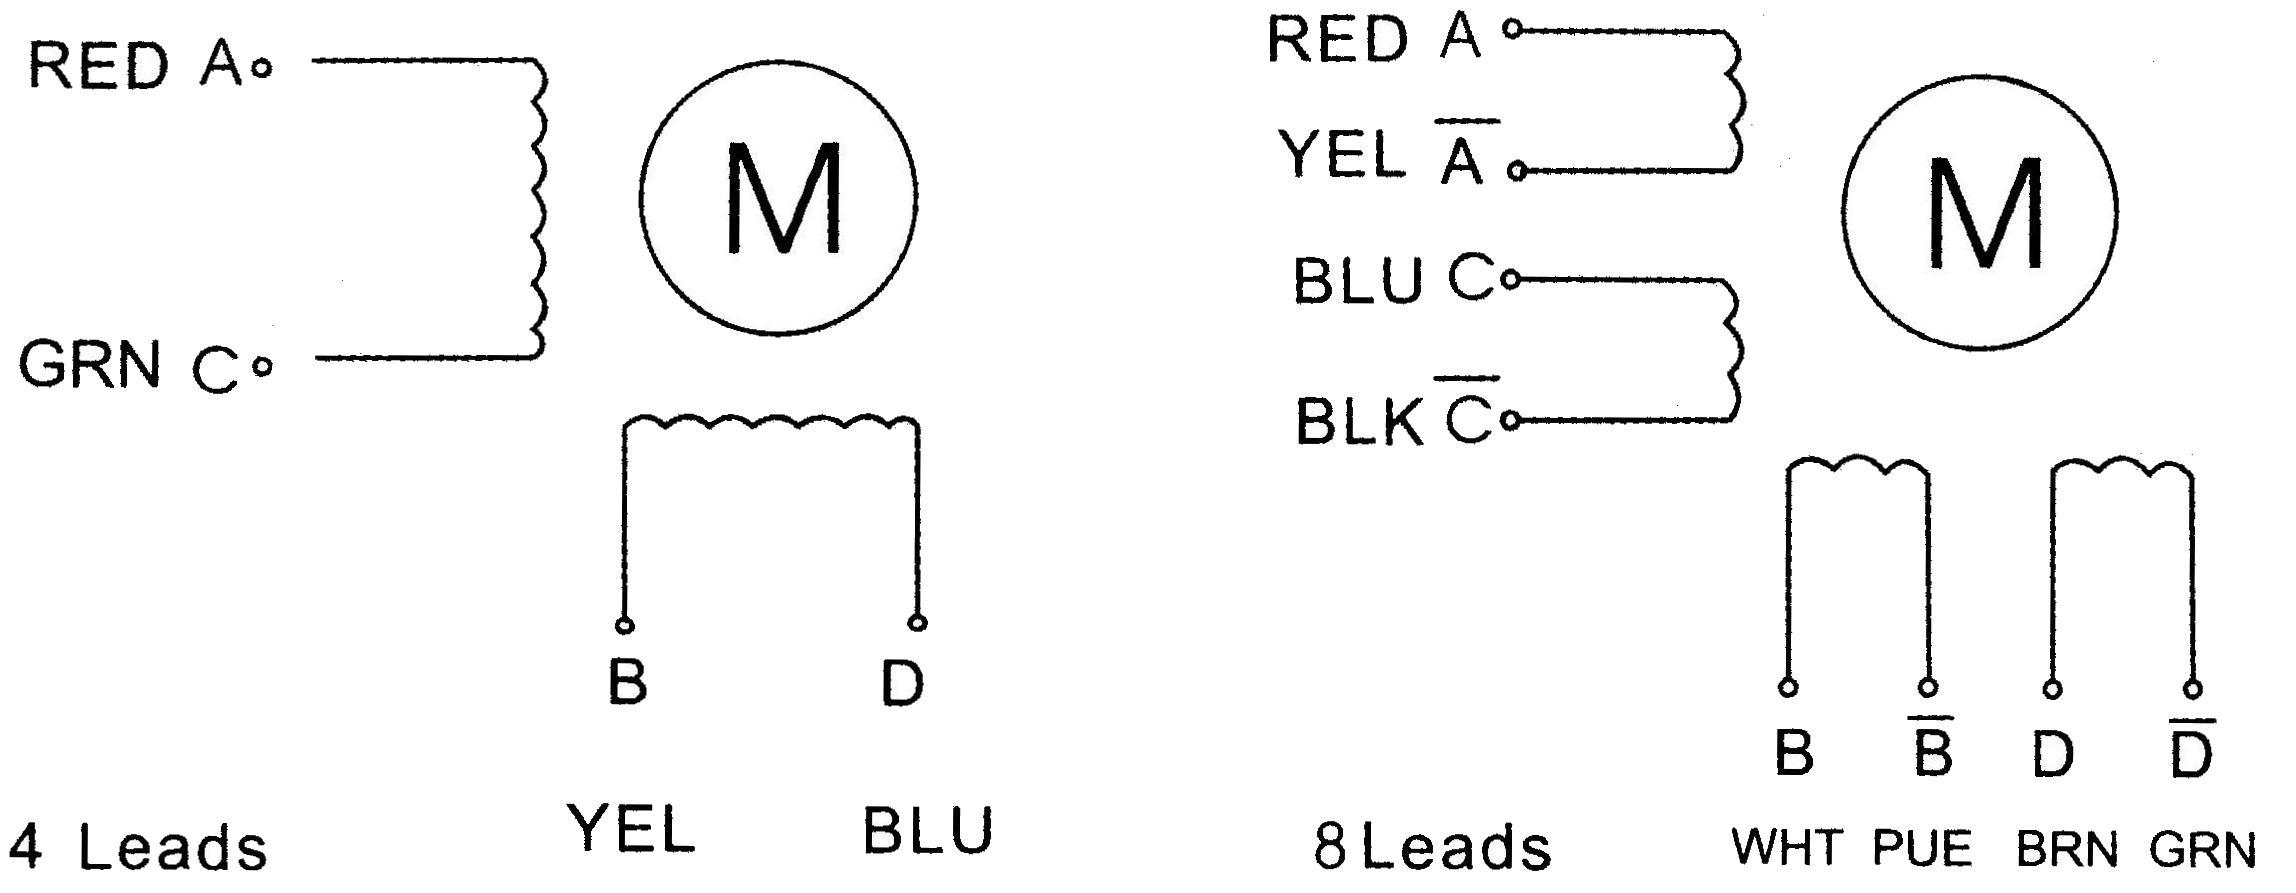 Wiring Diagram?resize\\\\\\\=665%2C259\\\\\\\&ssl\\\\\\\=1 samsung sod14c wiring diagram gandul 45 77 79 119 samsung soc c120 wiring diagram at aneh.co